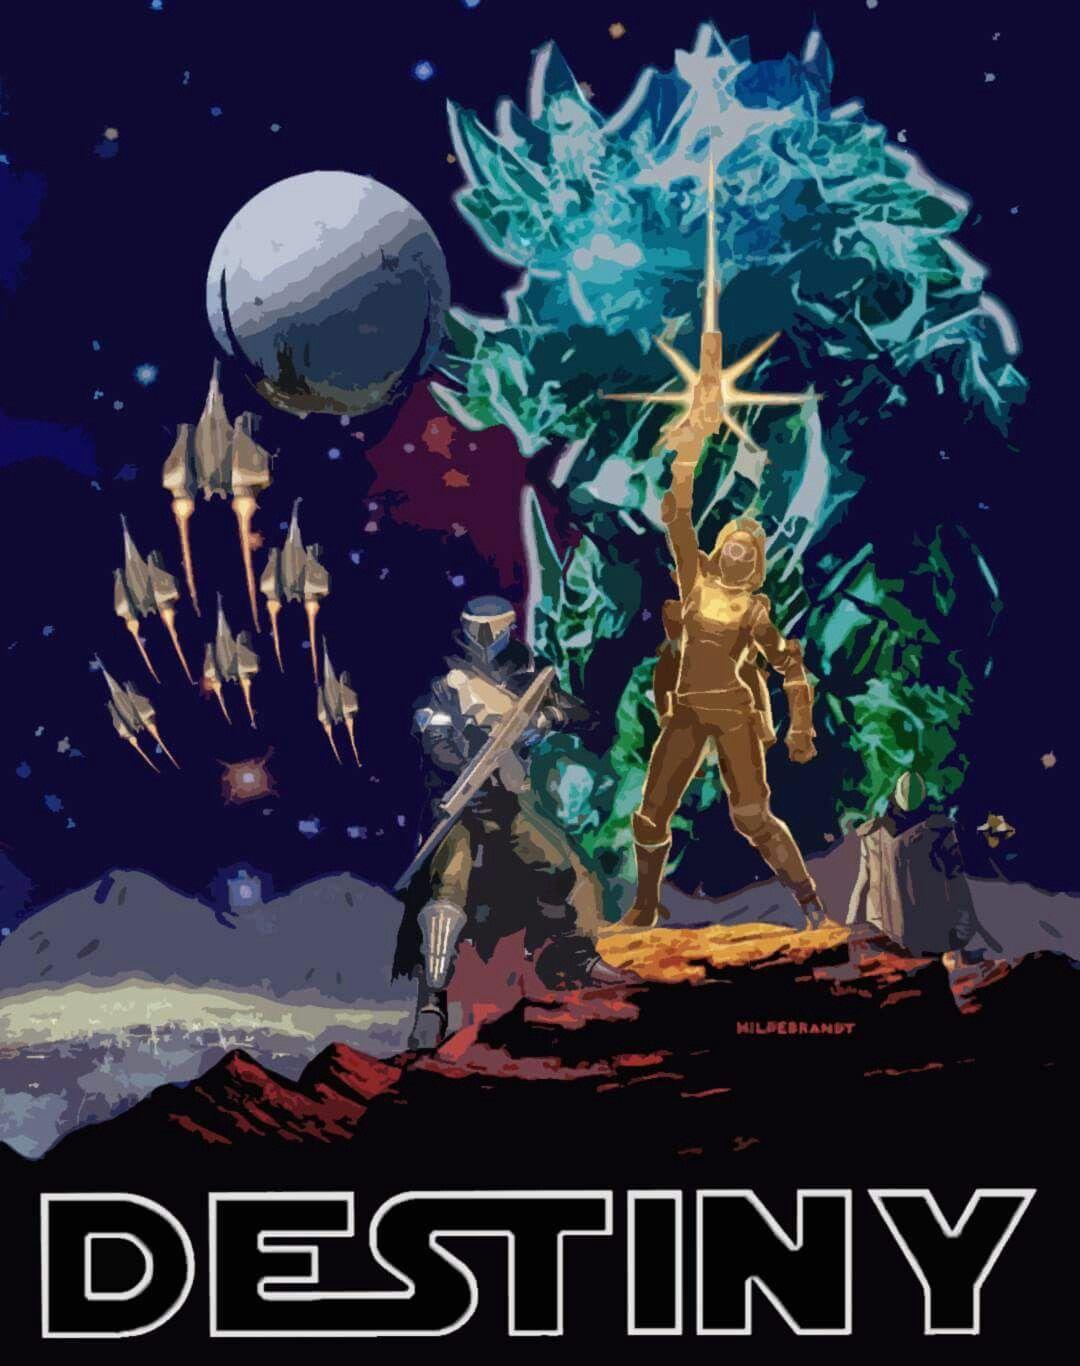 Super fan art (Destiny)